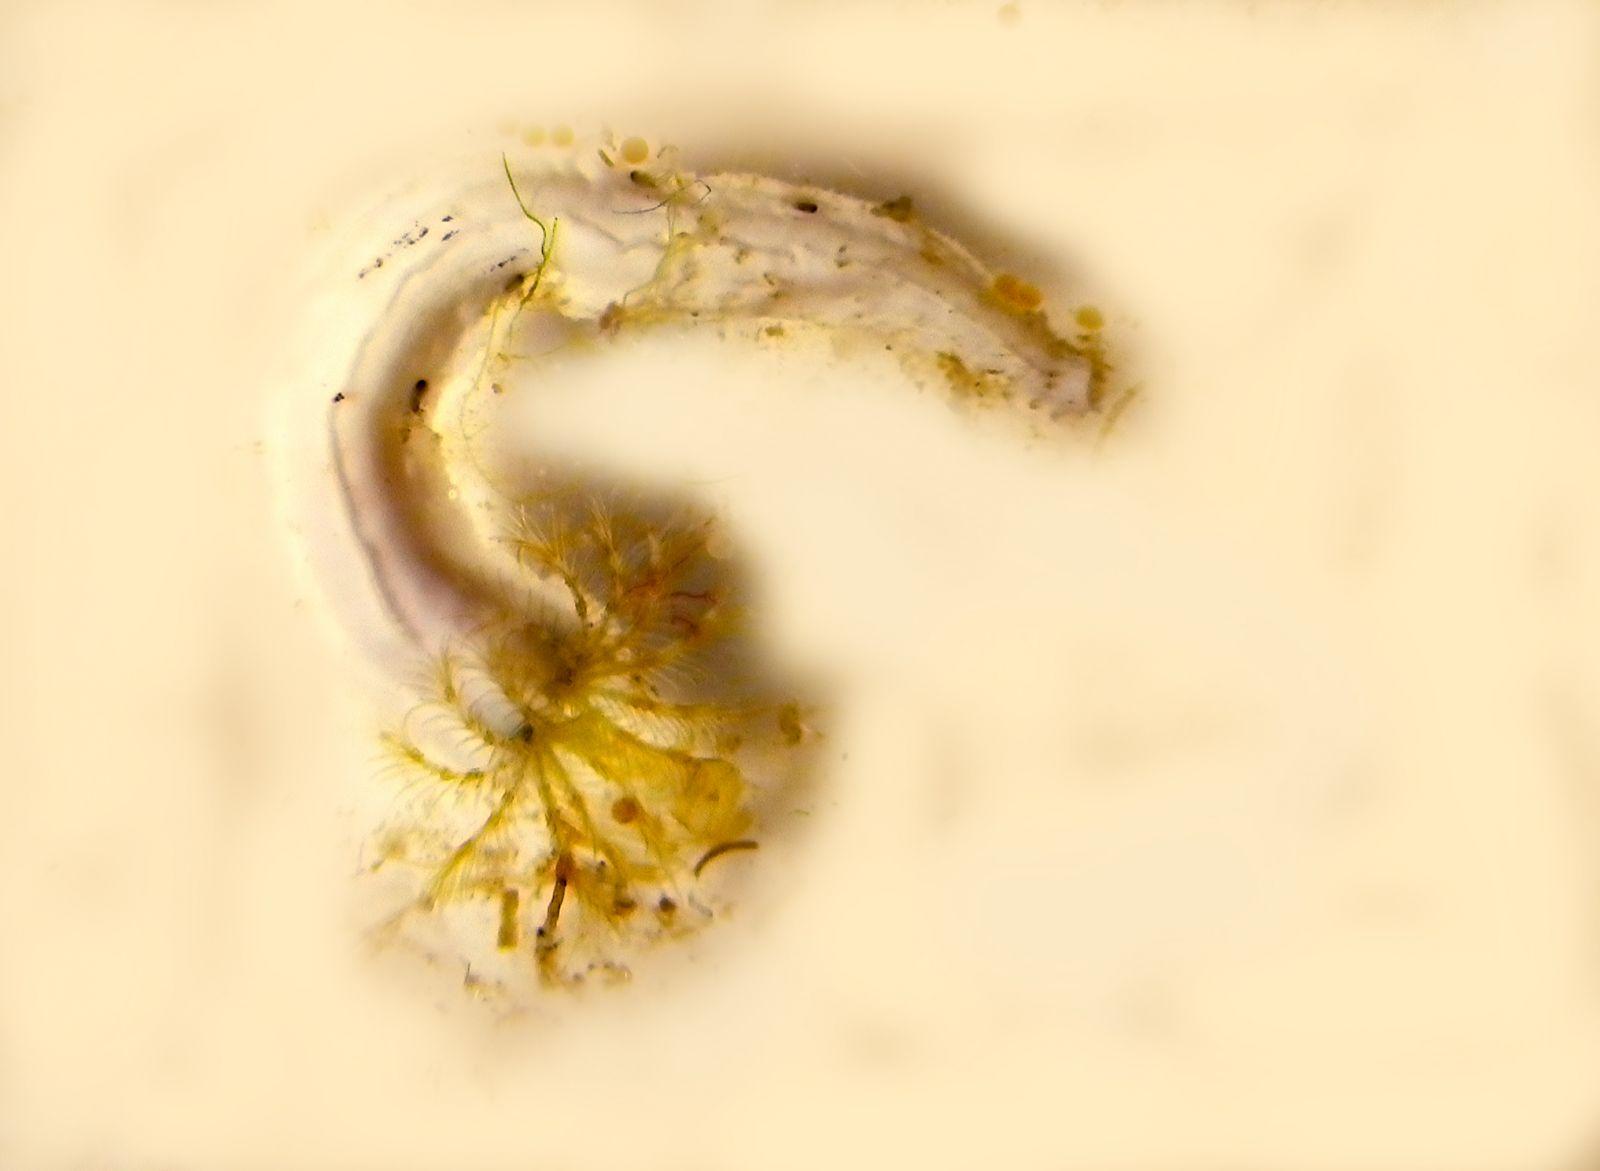 Keel worm on a Virtue disc. Photo: Mikael Olsson